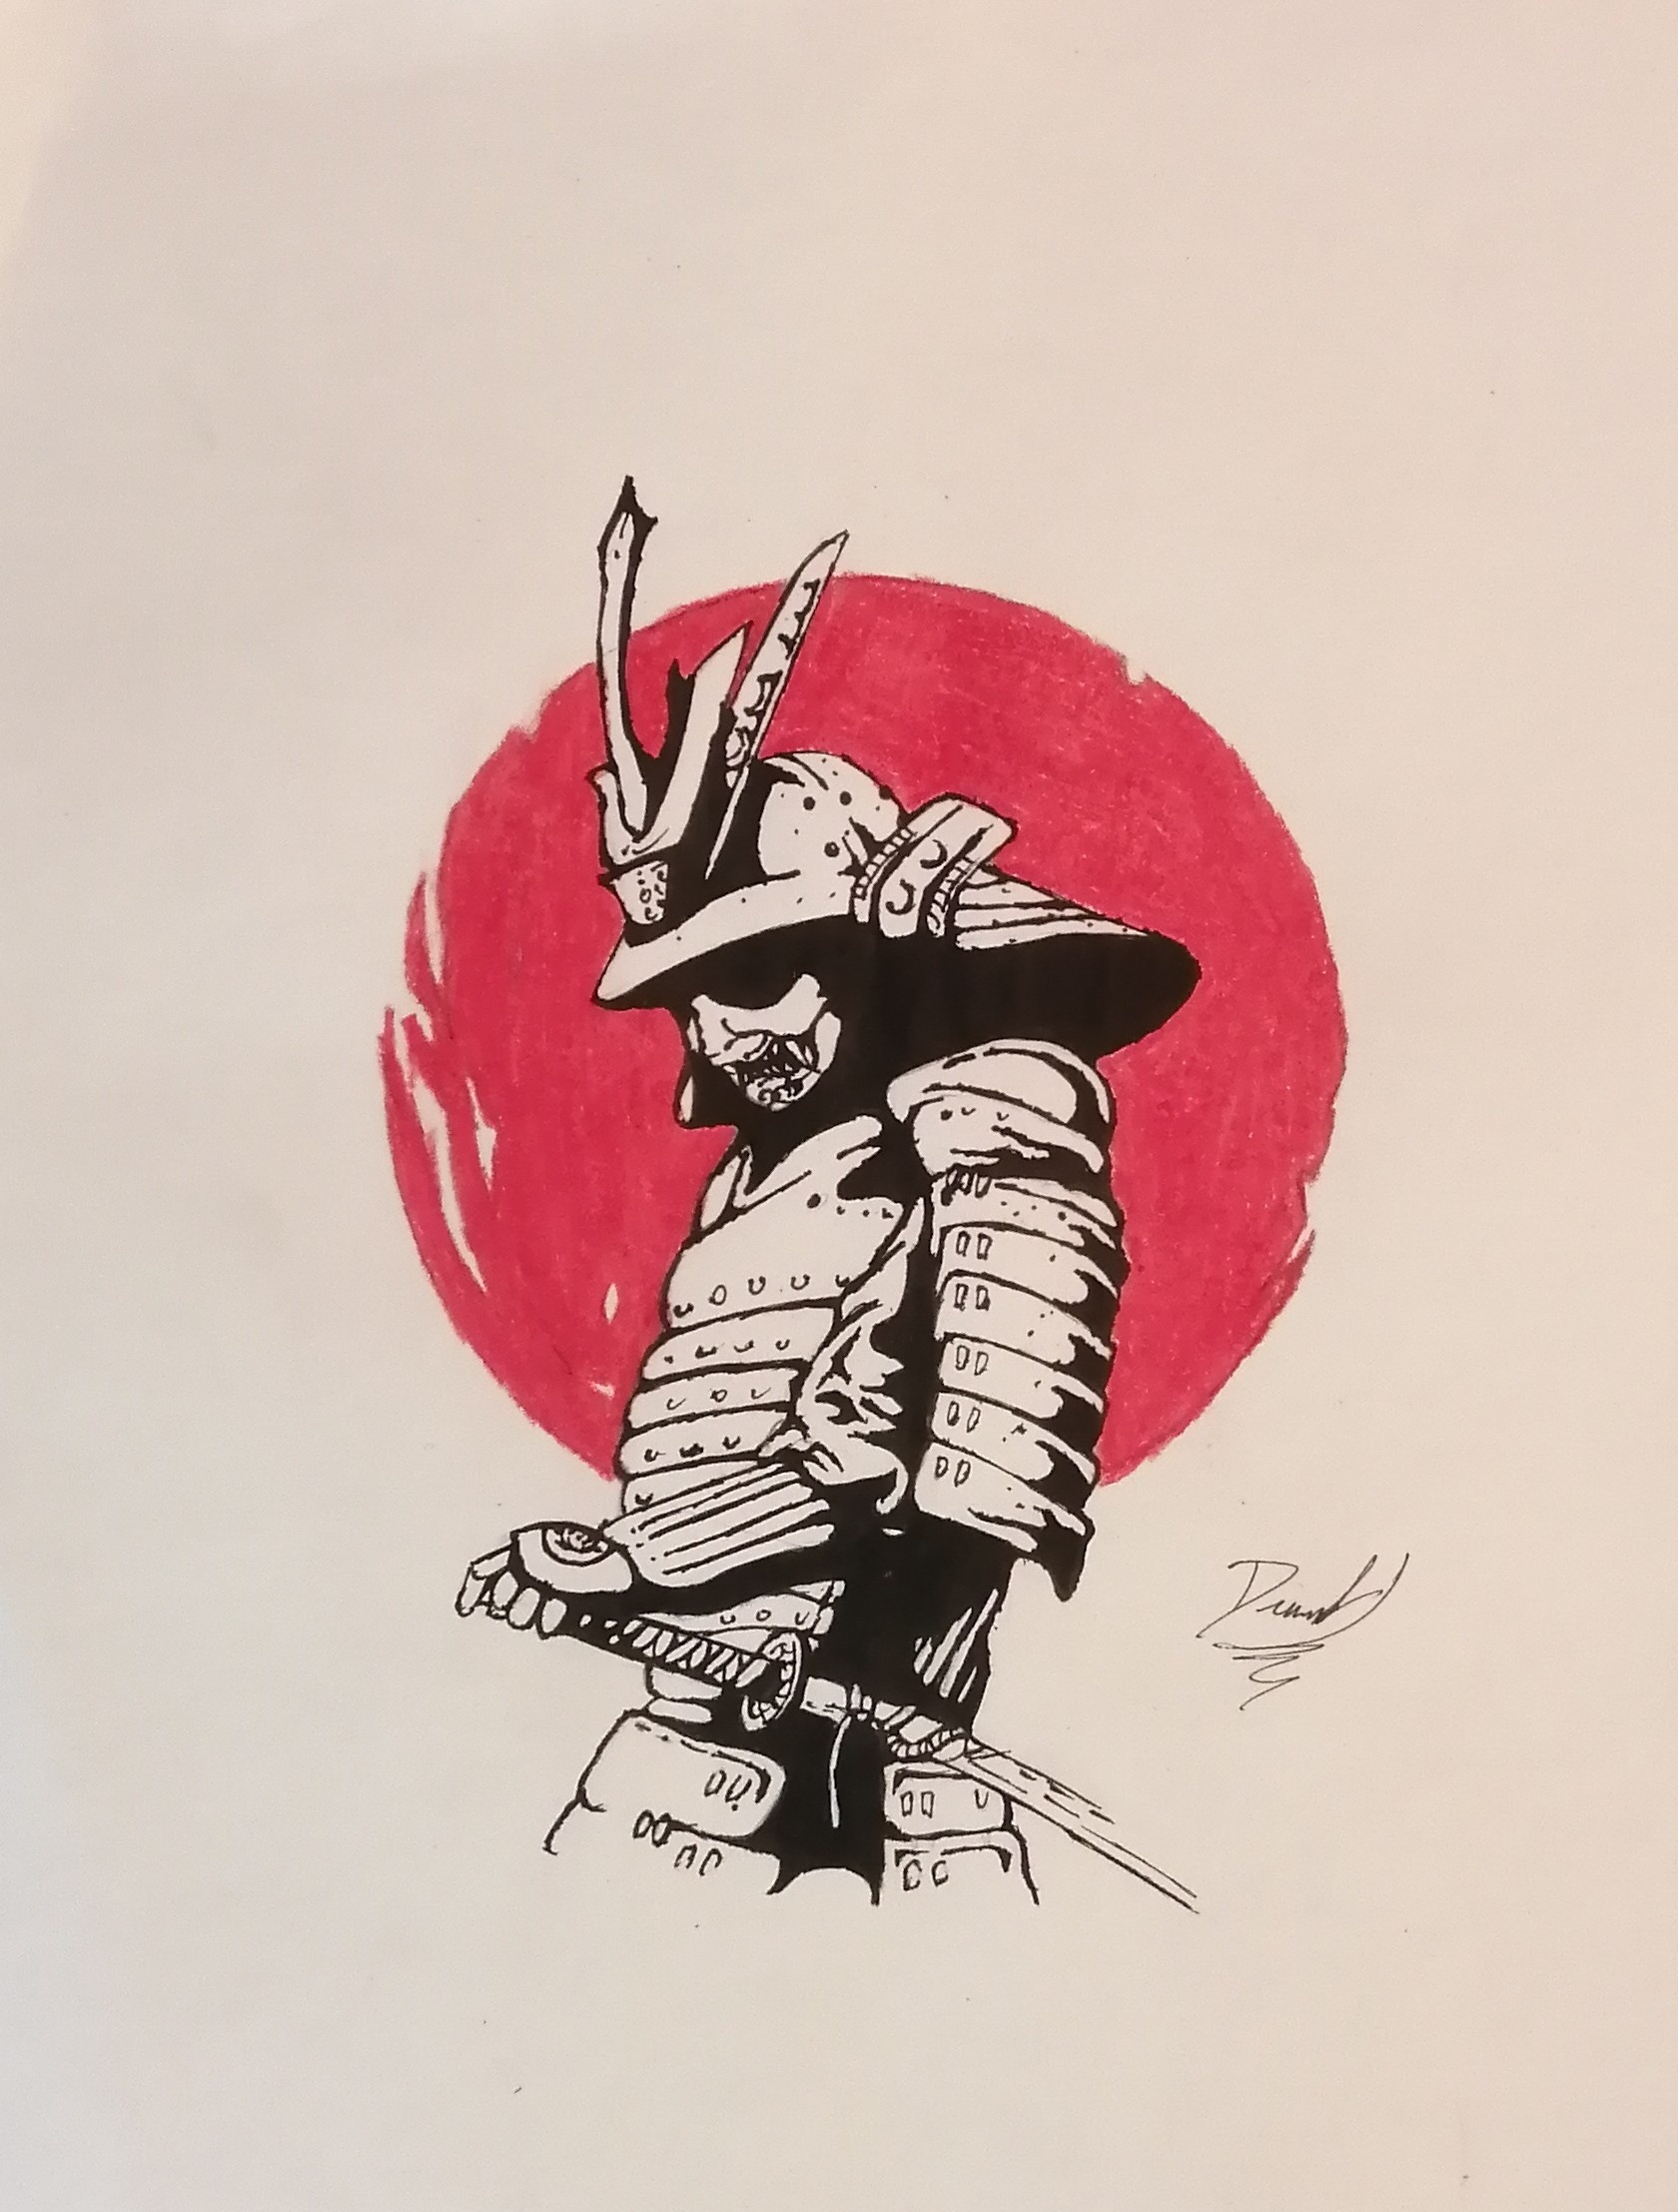 La Concentracion Del Samurai Lapiz Rotulador Tecnica Mixta Tinta Dibujos Comprar Arte Original